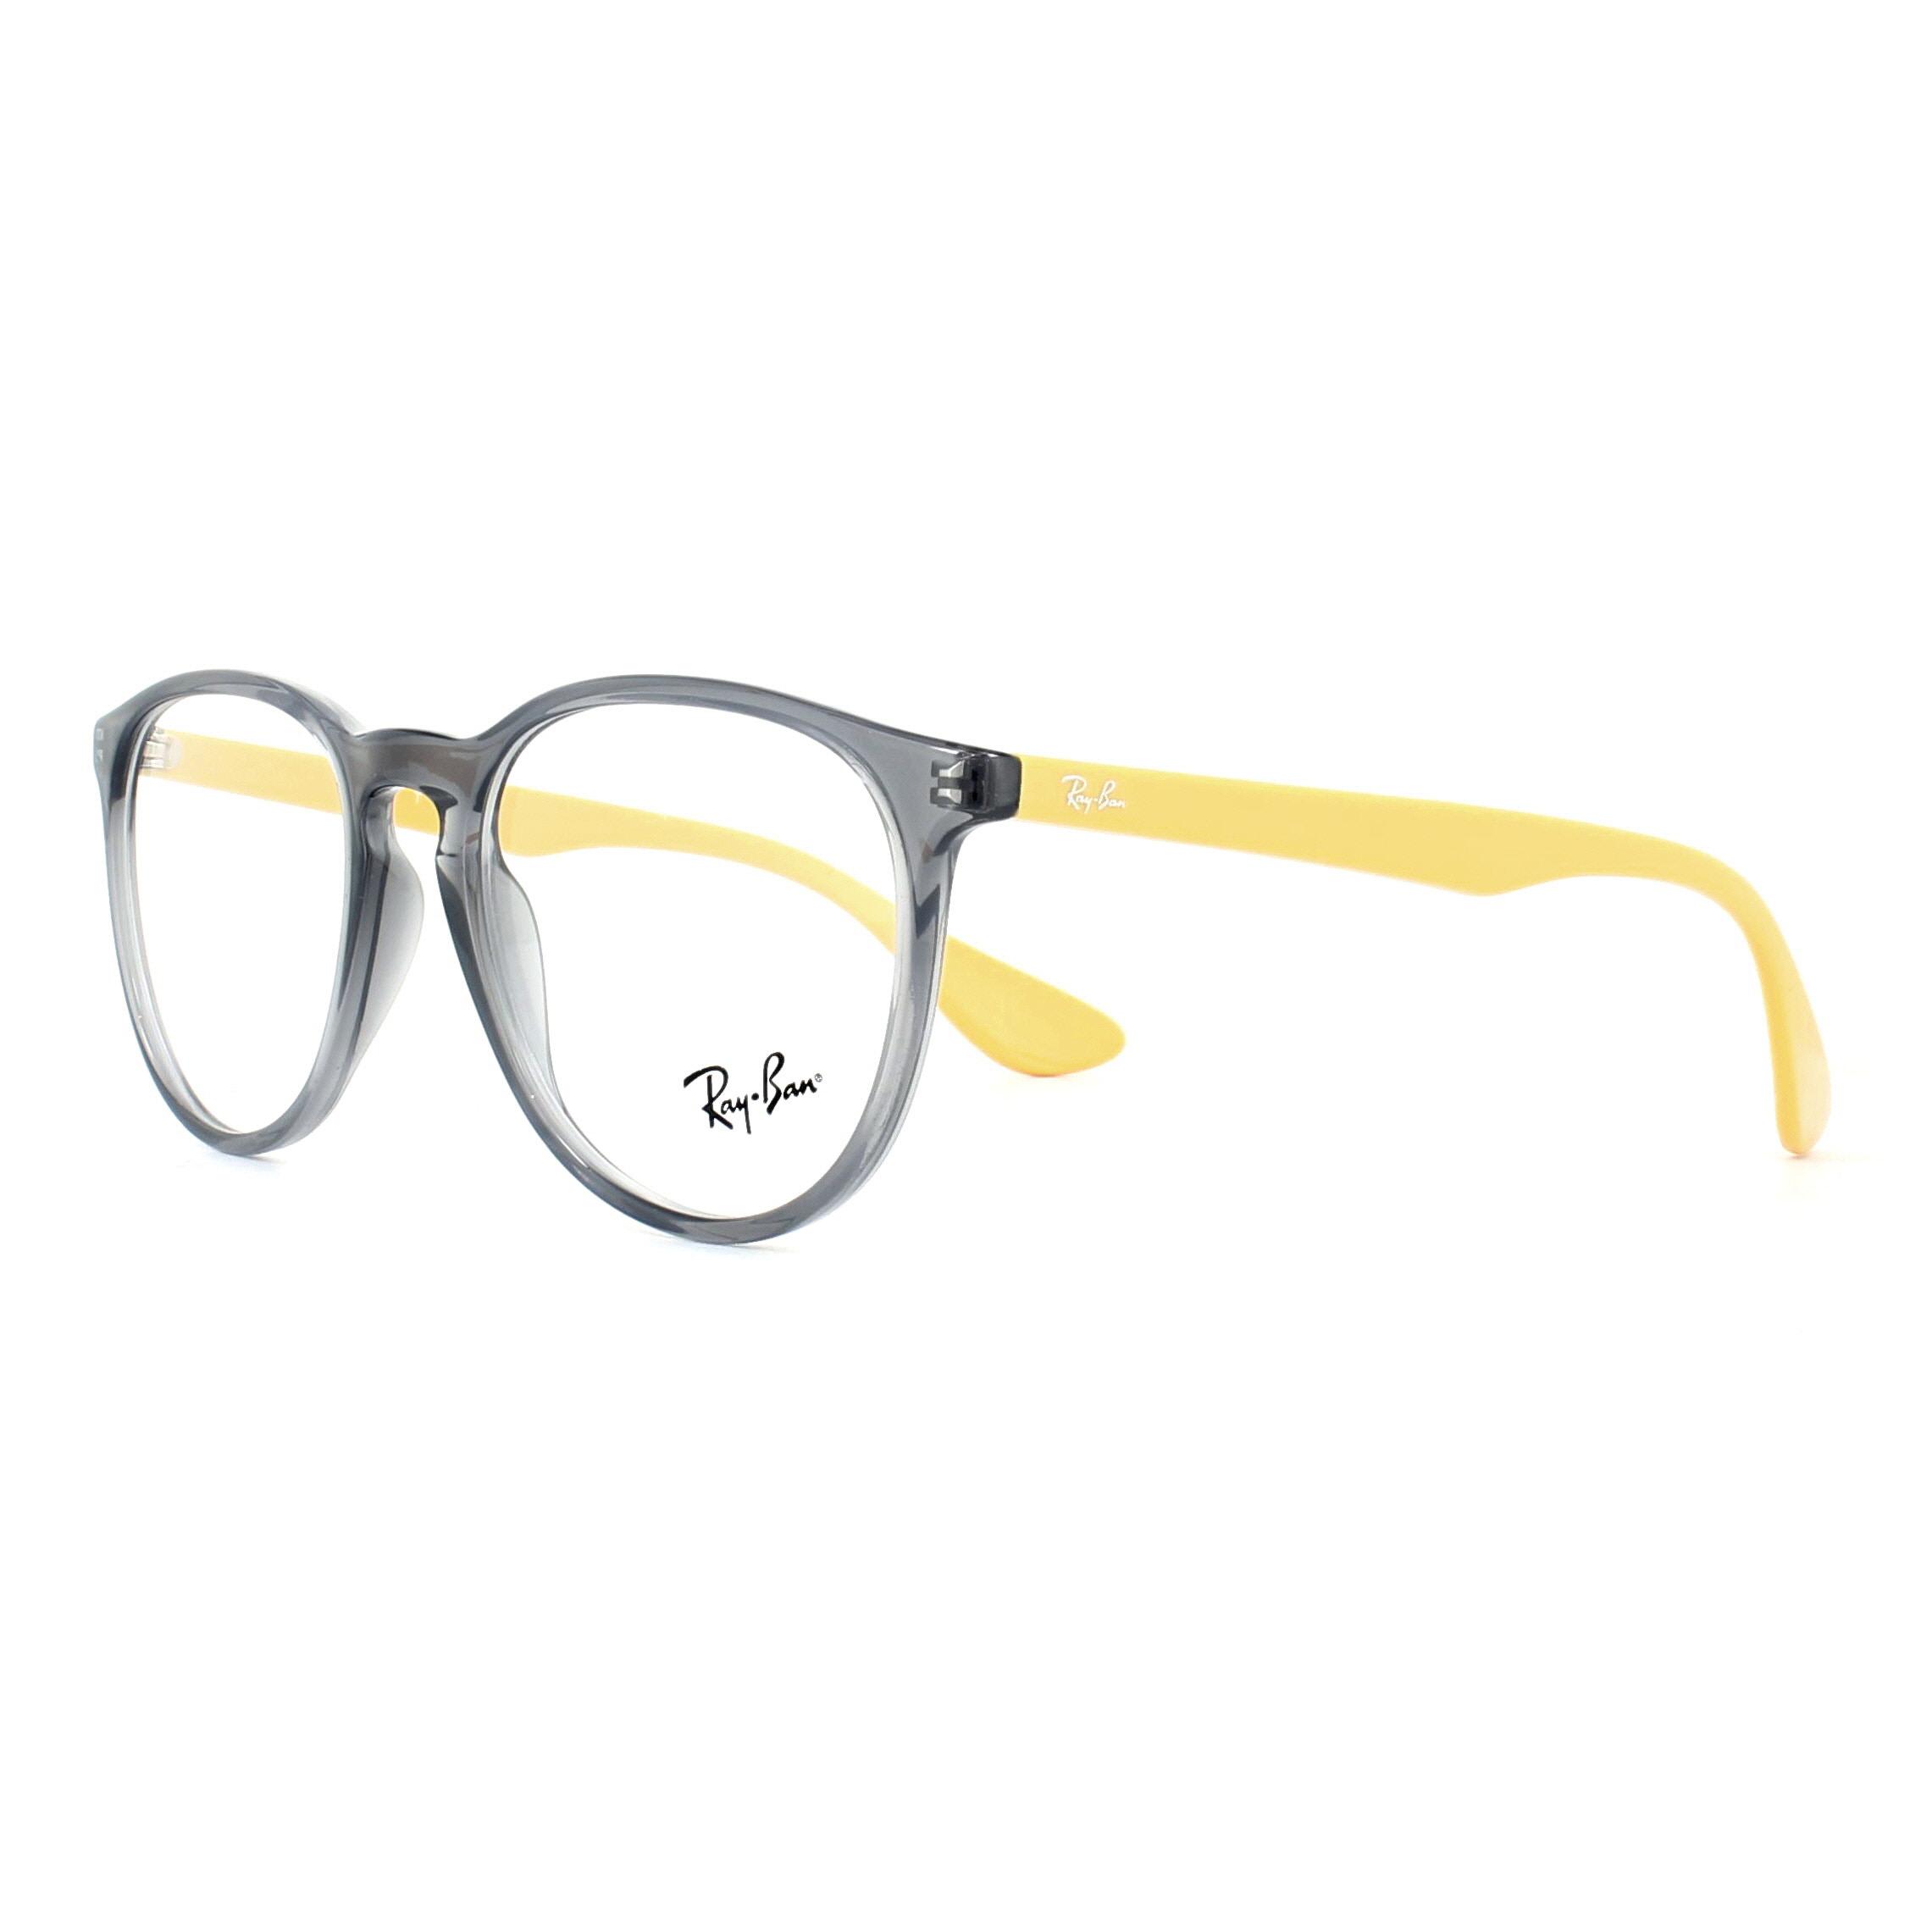 c3937f519a Sentinel Ray-Ban Glasses Frames 7046 Erika 5733 Opal Grey Yellow 51mm Womens